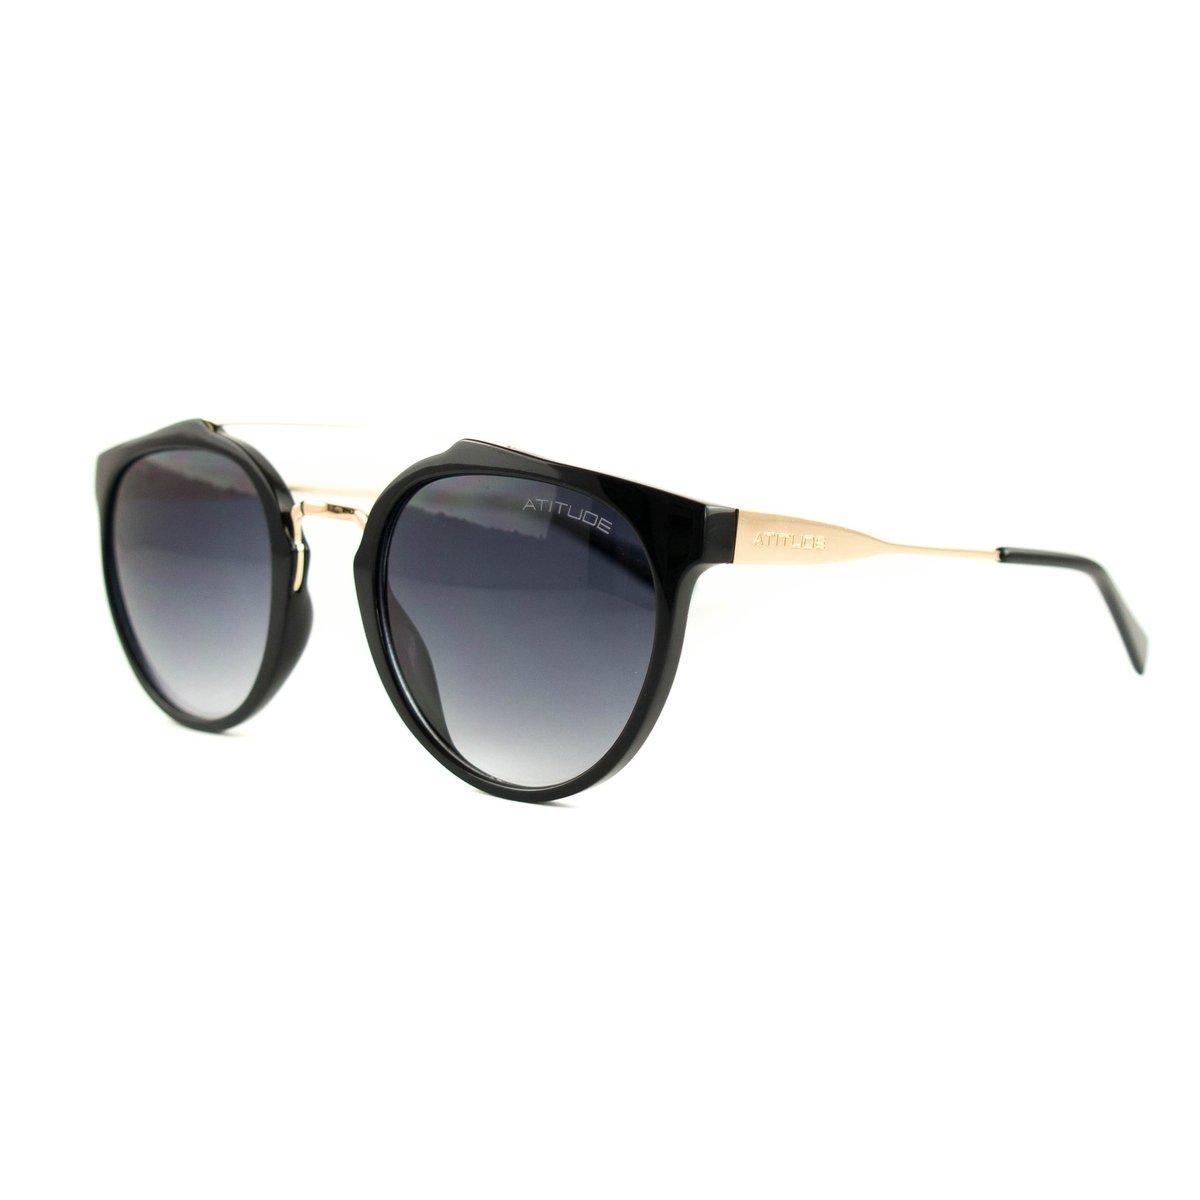 53a760c8e6a60 Óculos Atitude De Sol - Compre Agora